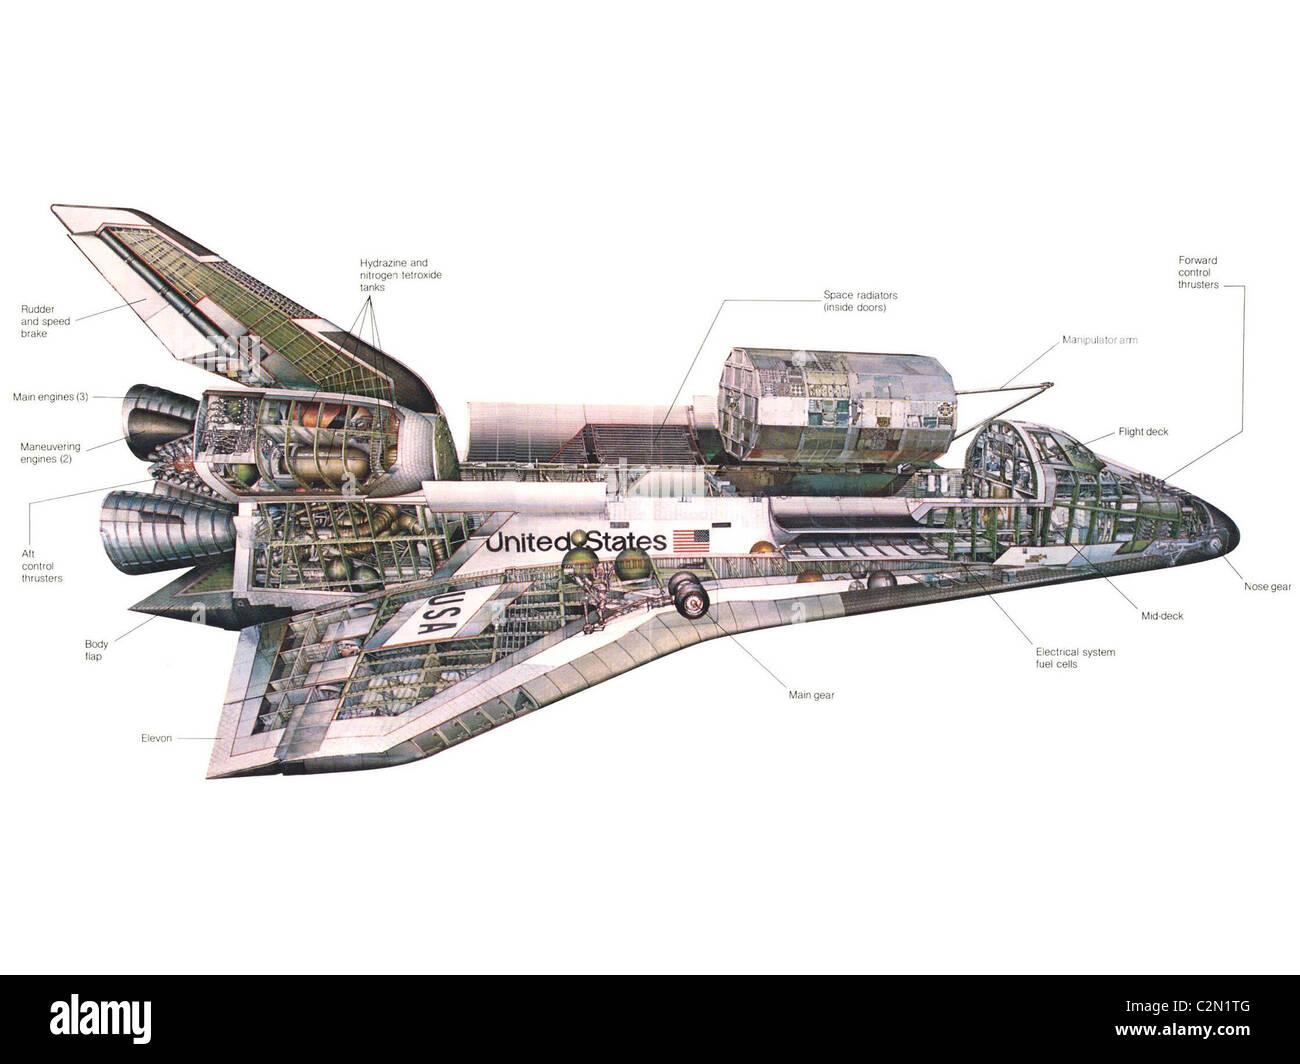 space shuttle orbiter diagram stock photo 36112512 alamy rh alamy com space shuttle diagram nasa space shuttle diagram poster